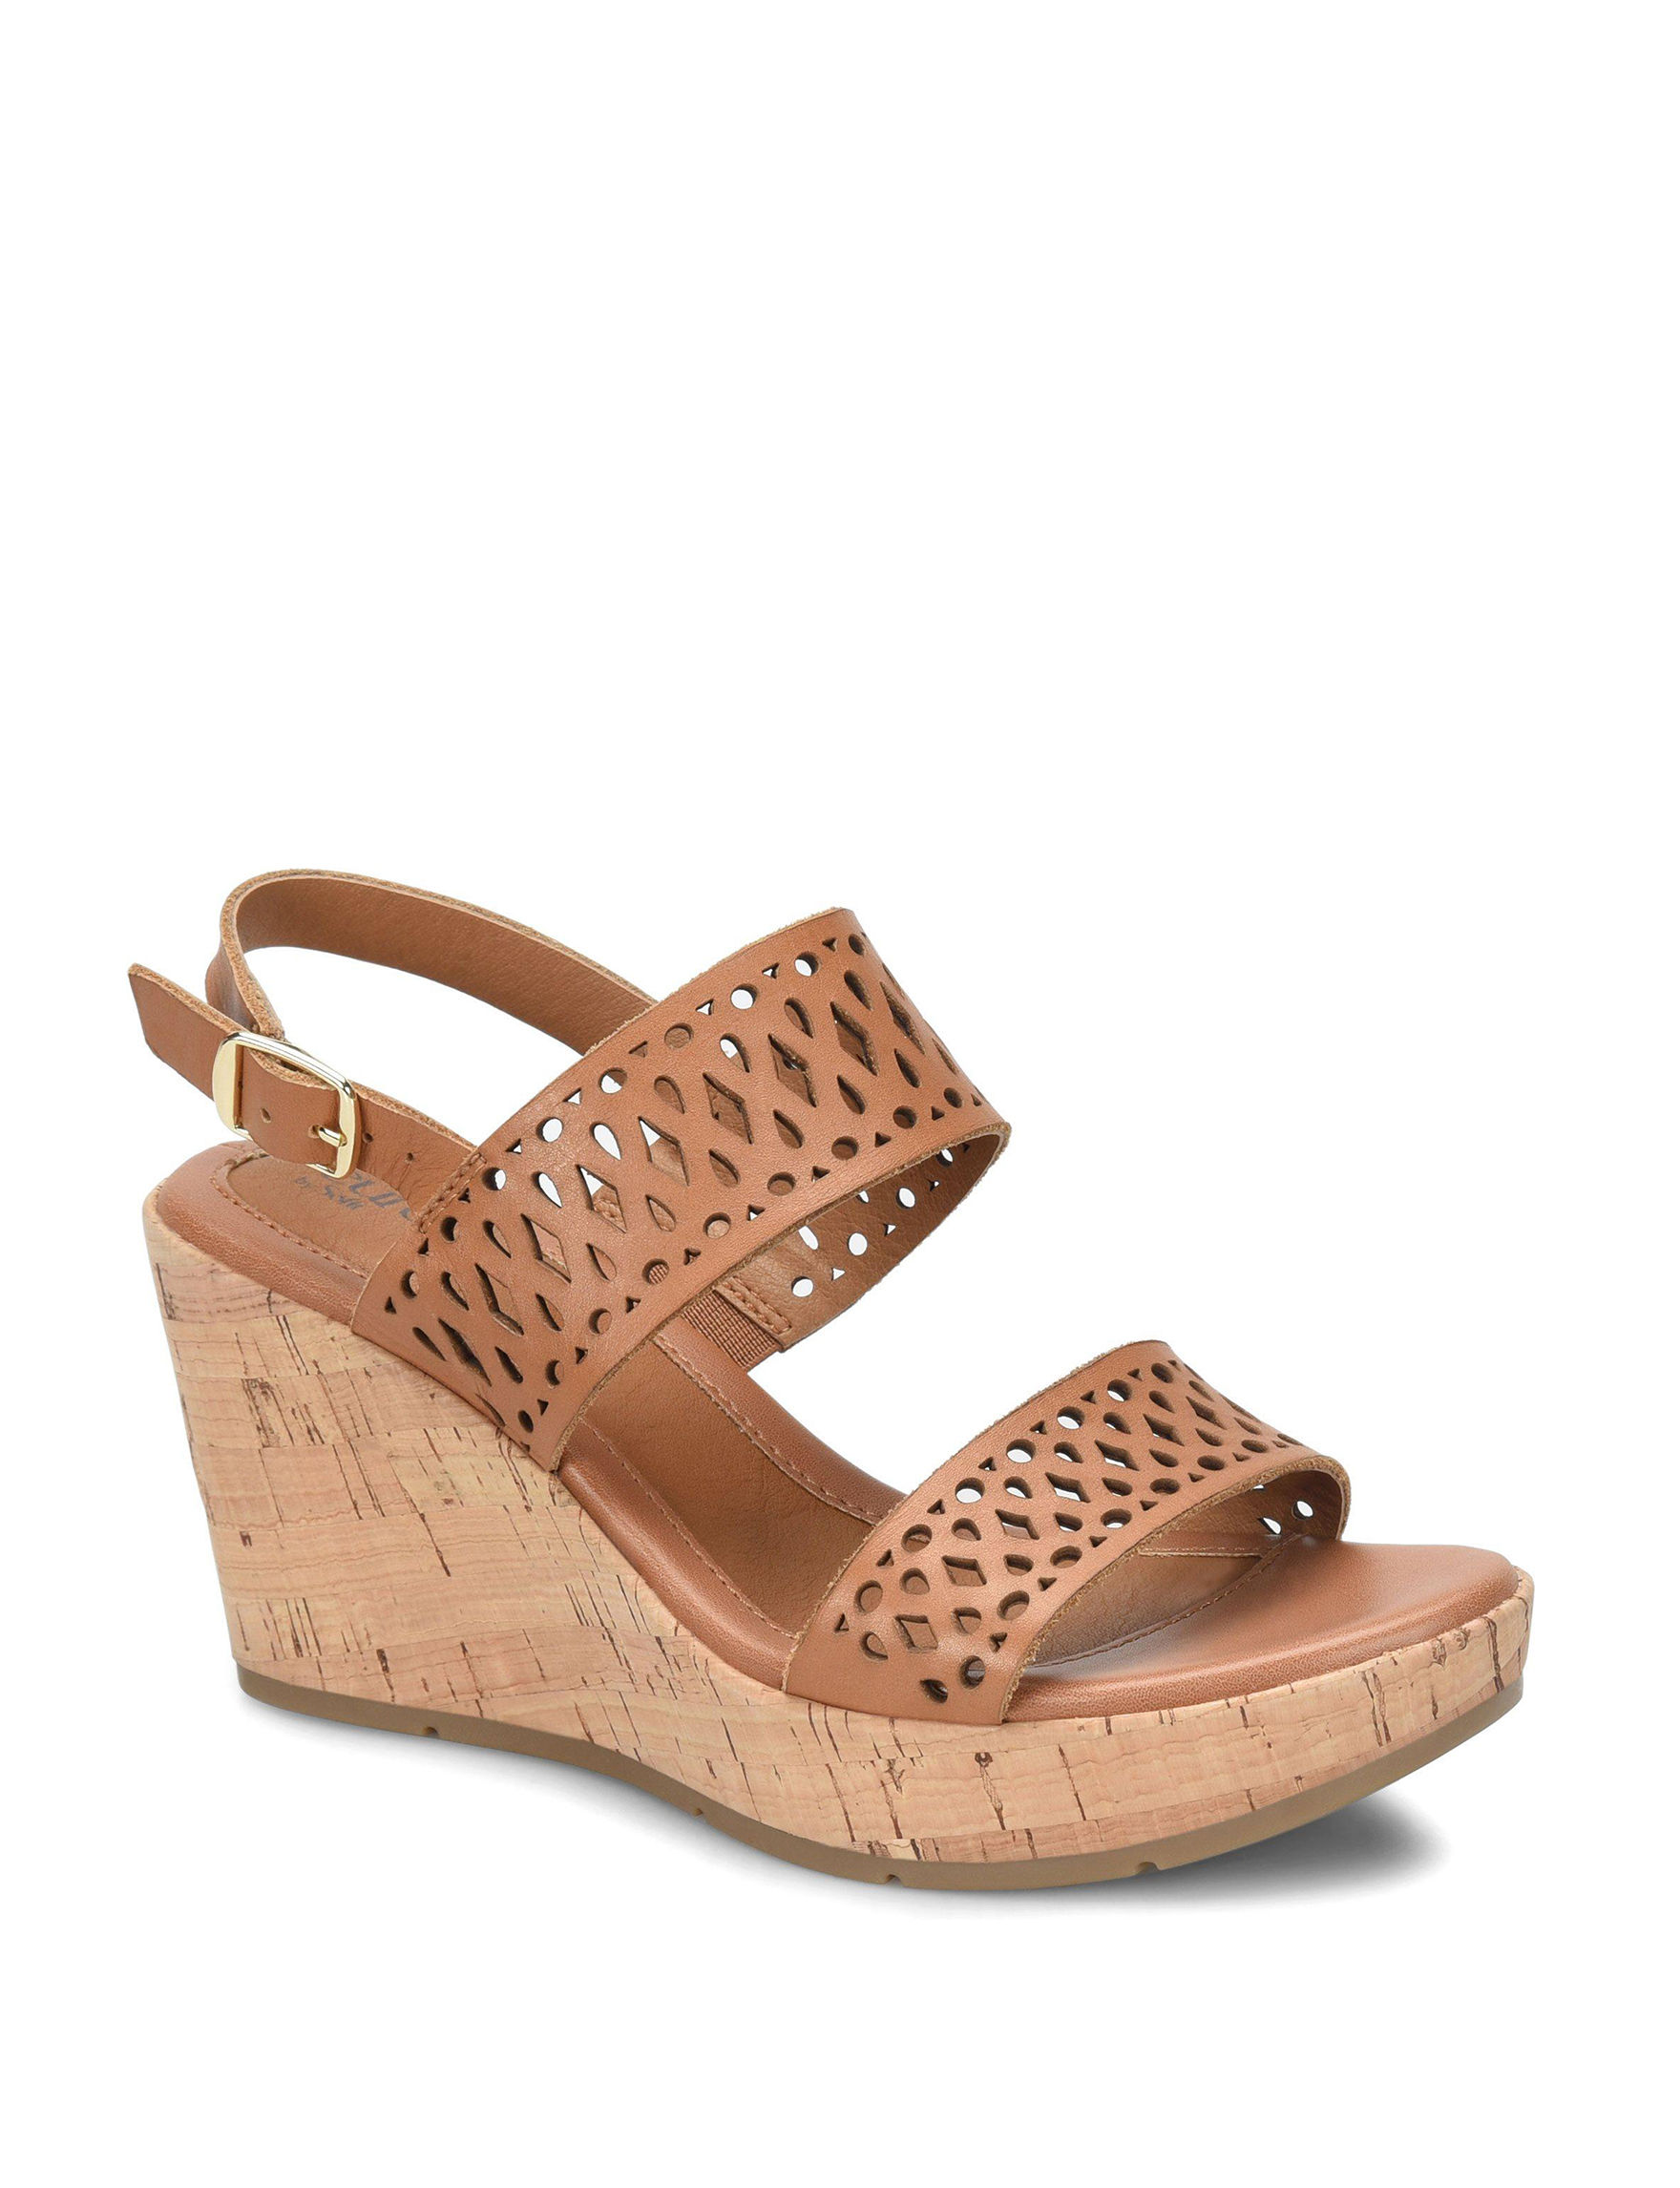 Eurosoft Brown Wedge Sandals